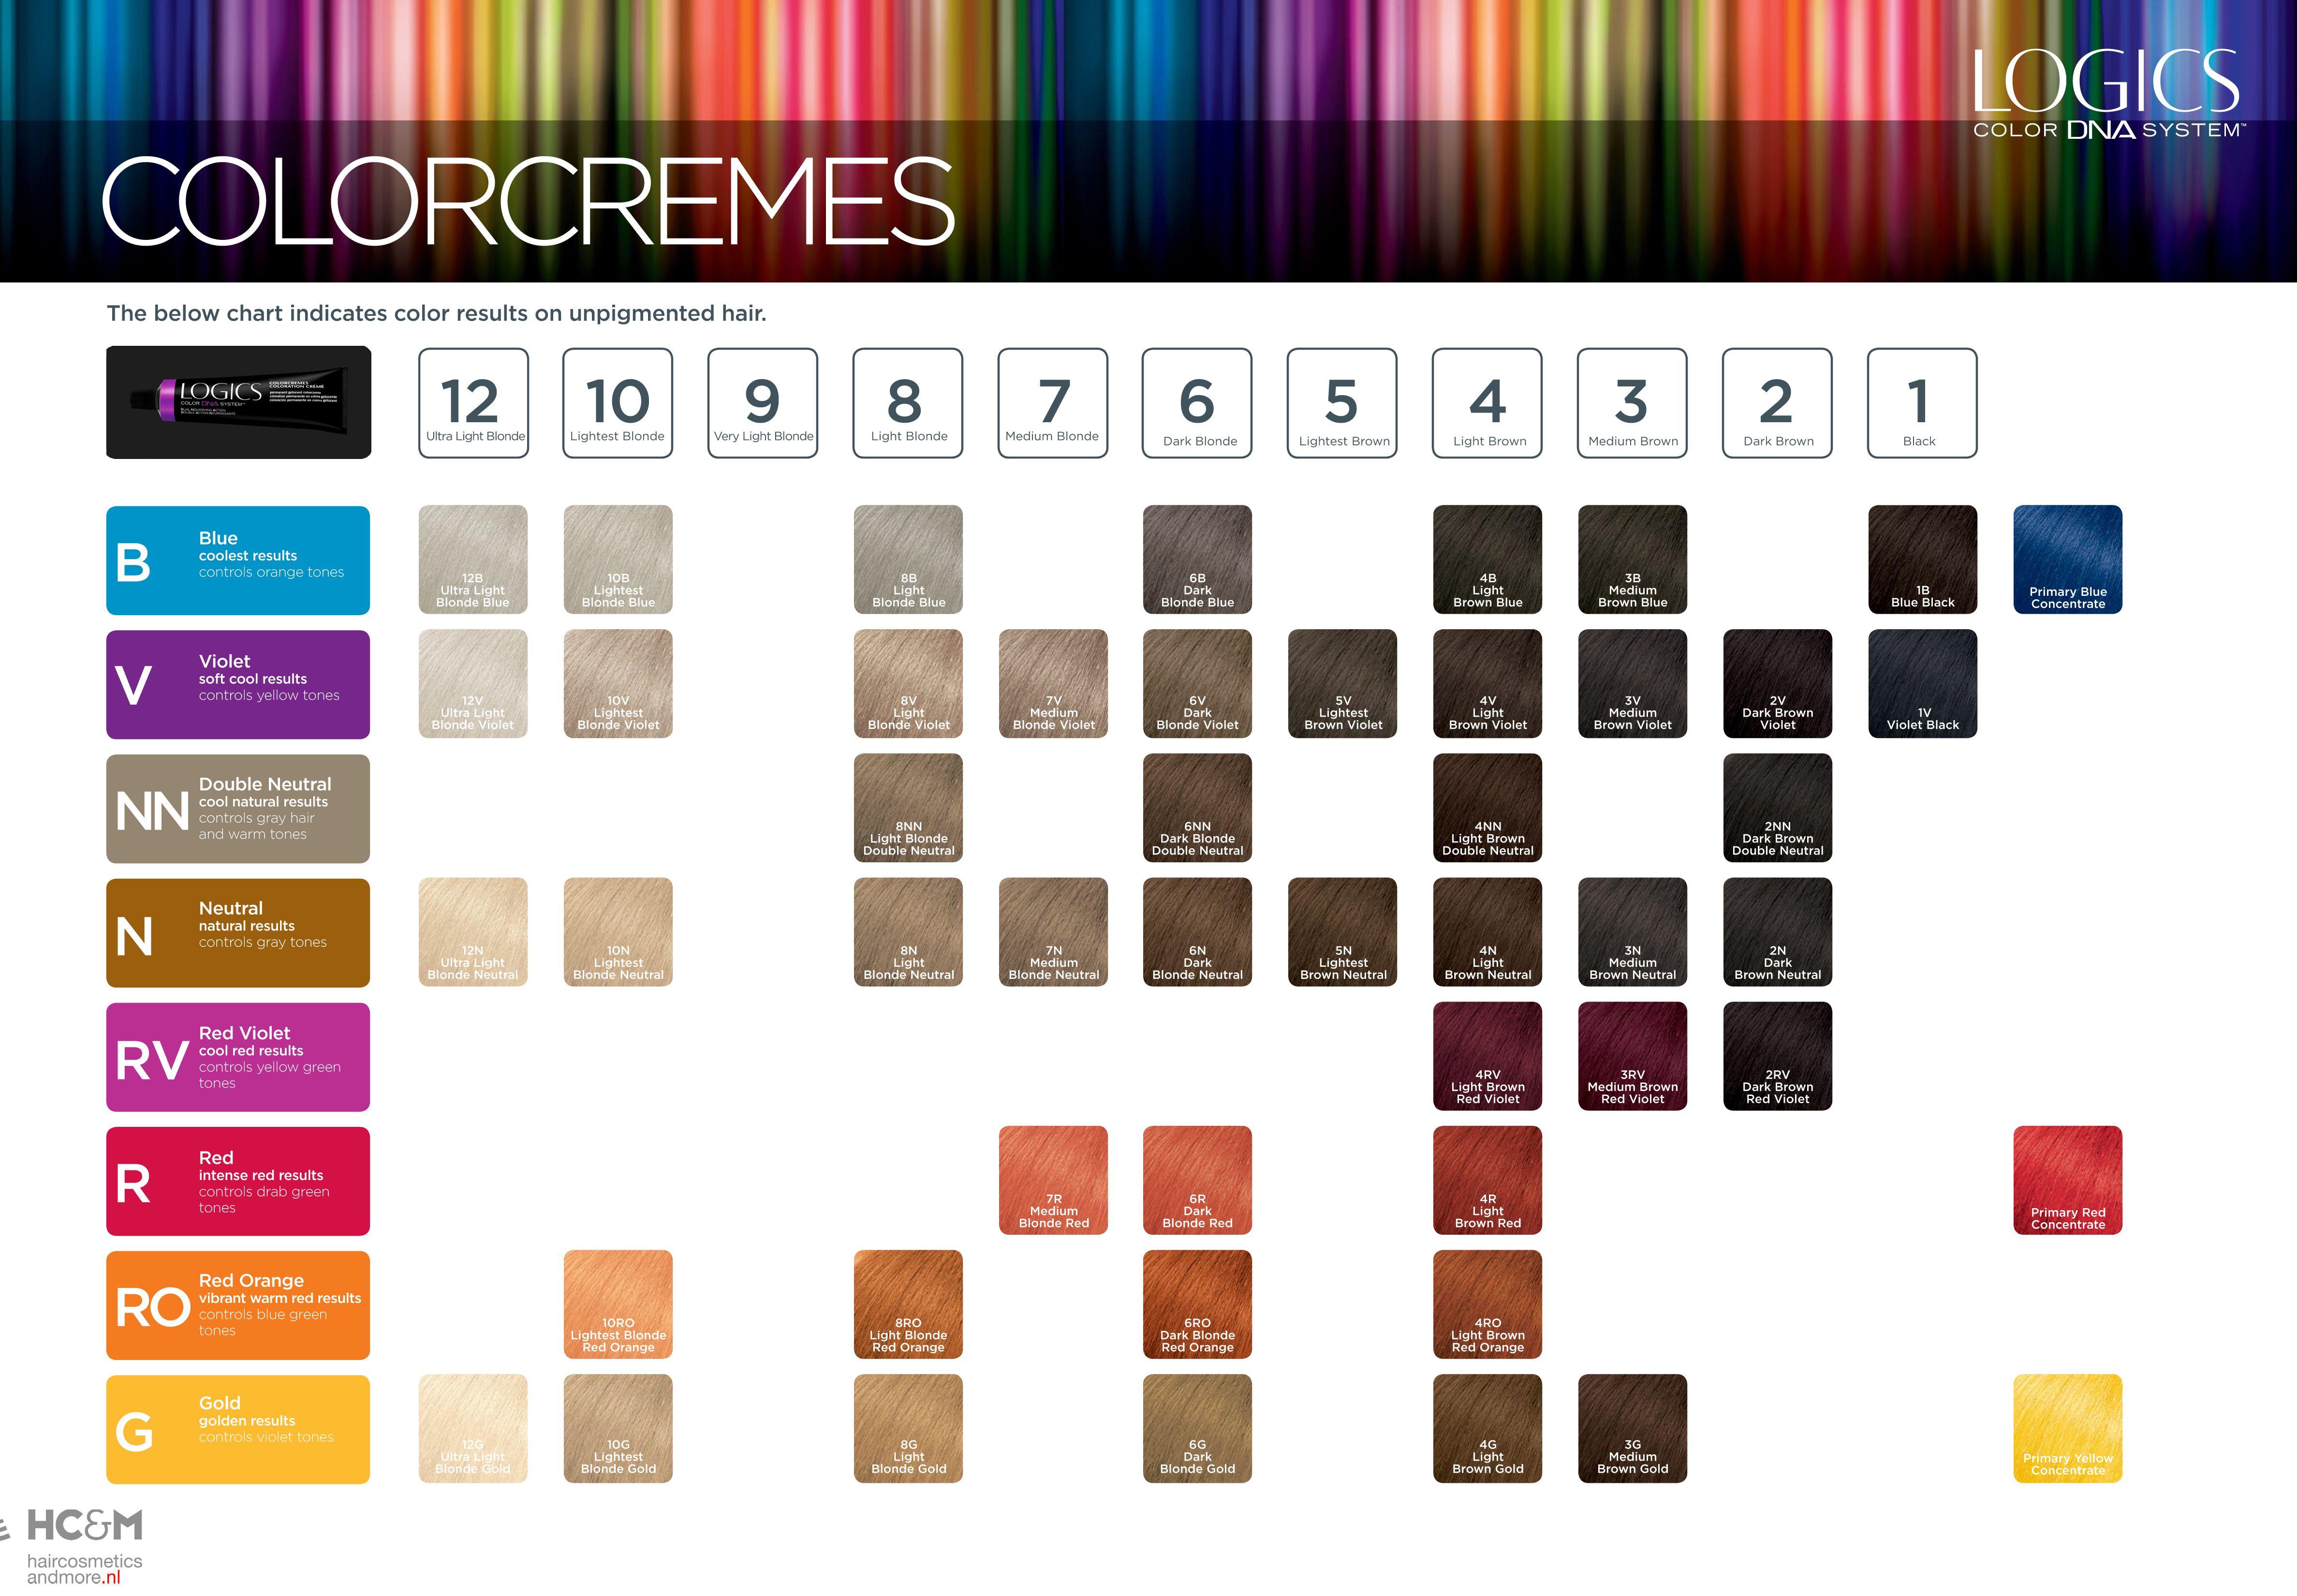 Logics Color DNA System Colorcremes Shades Palette